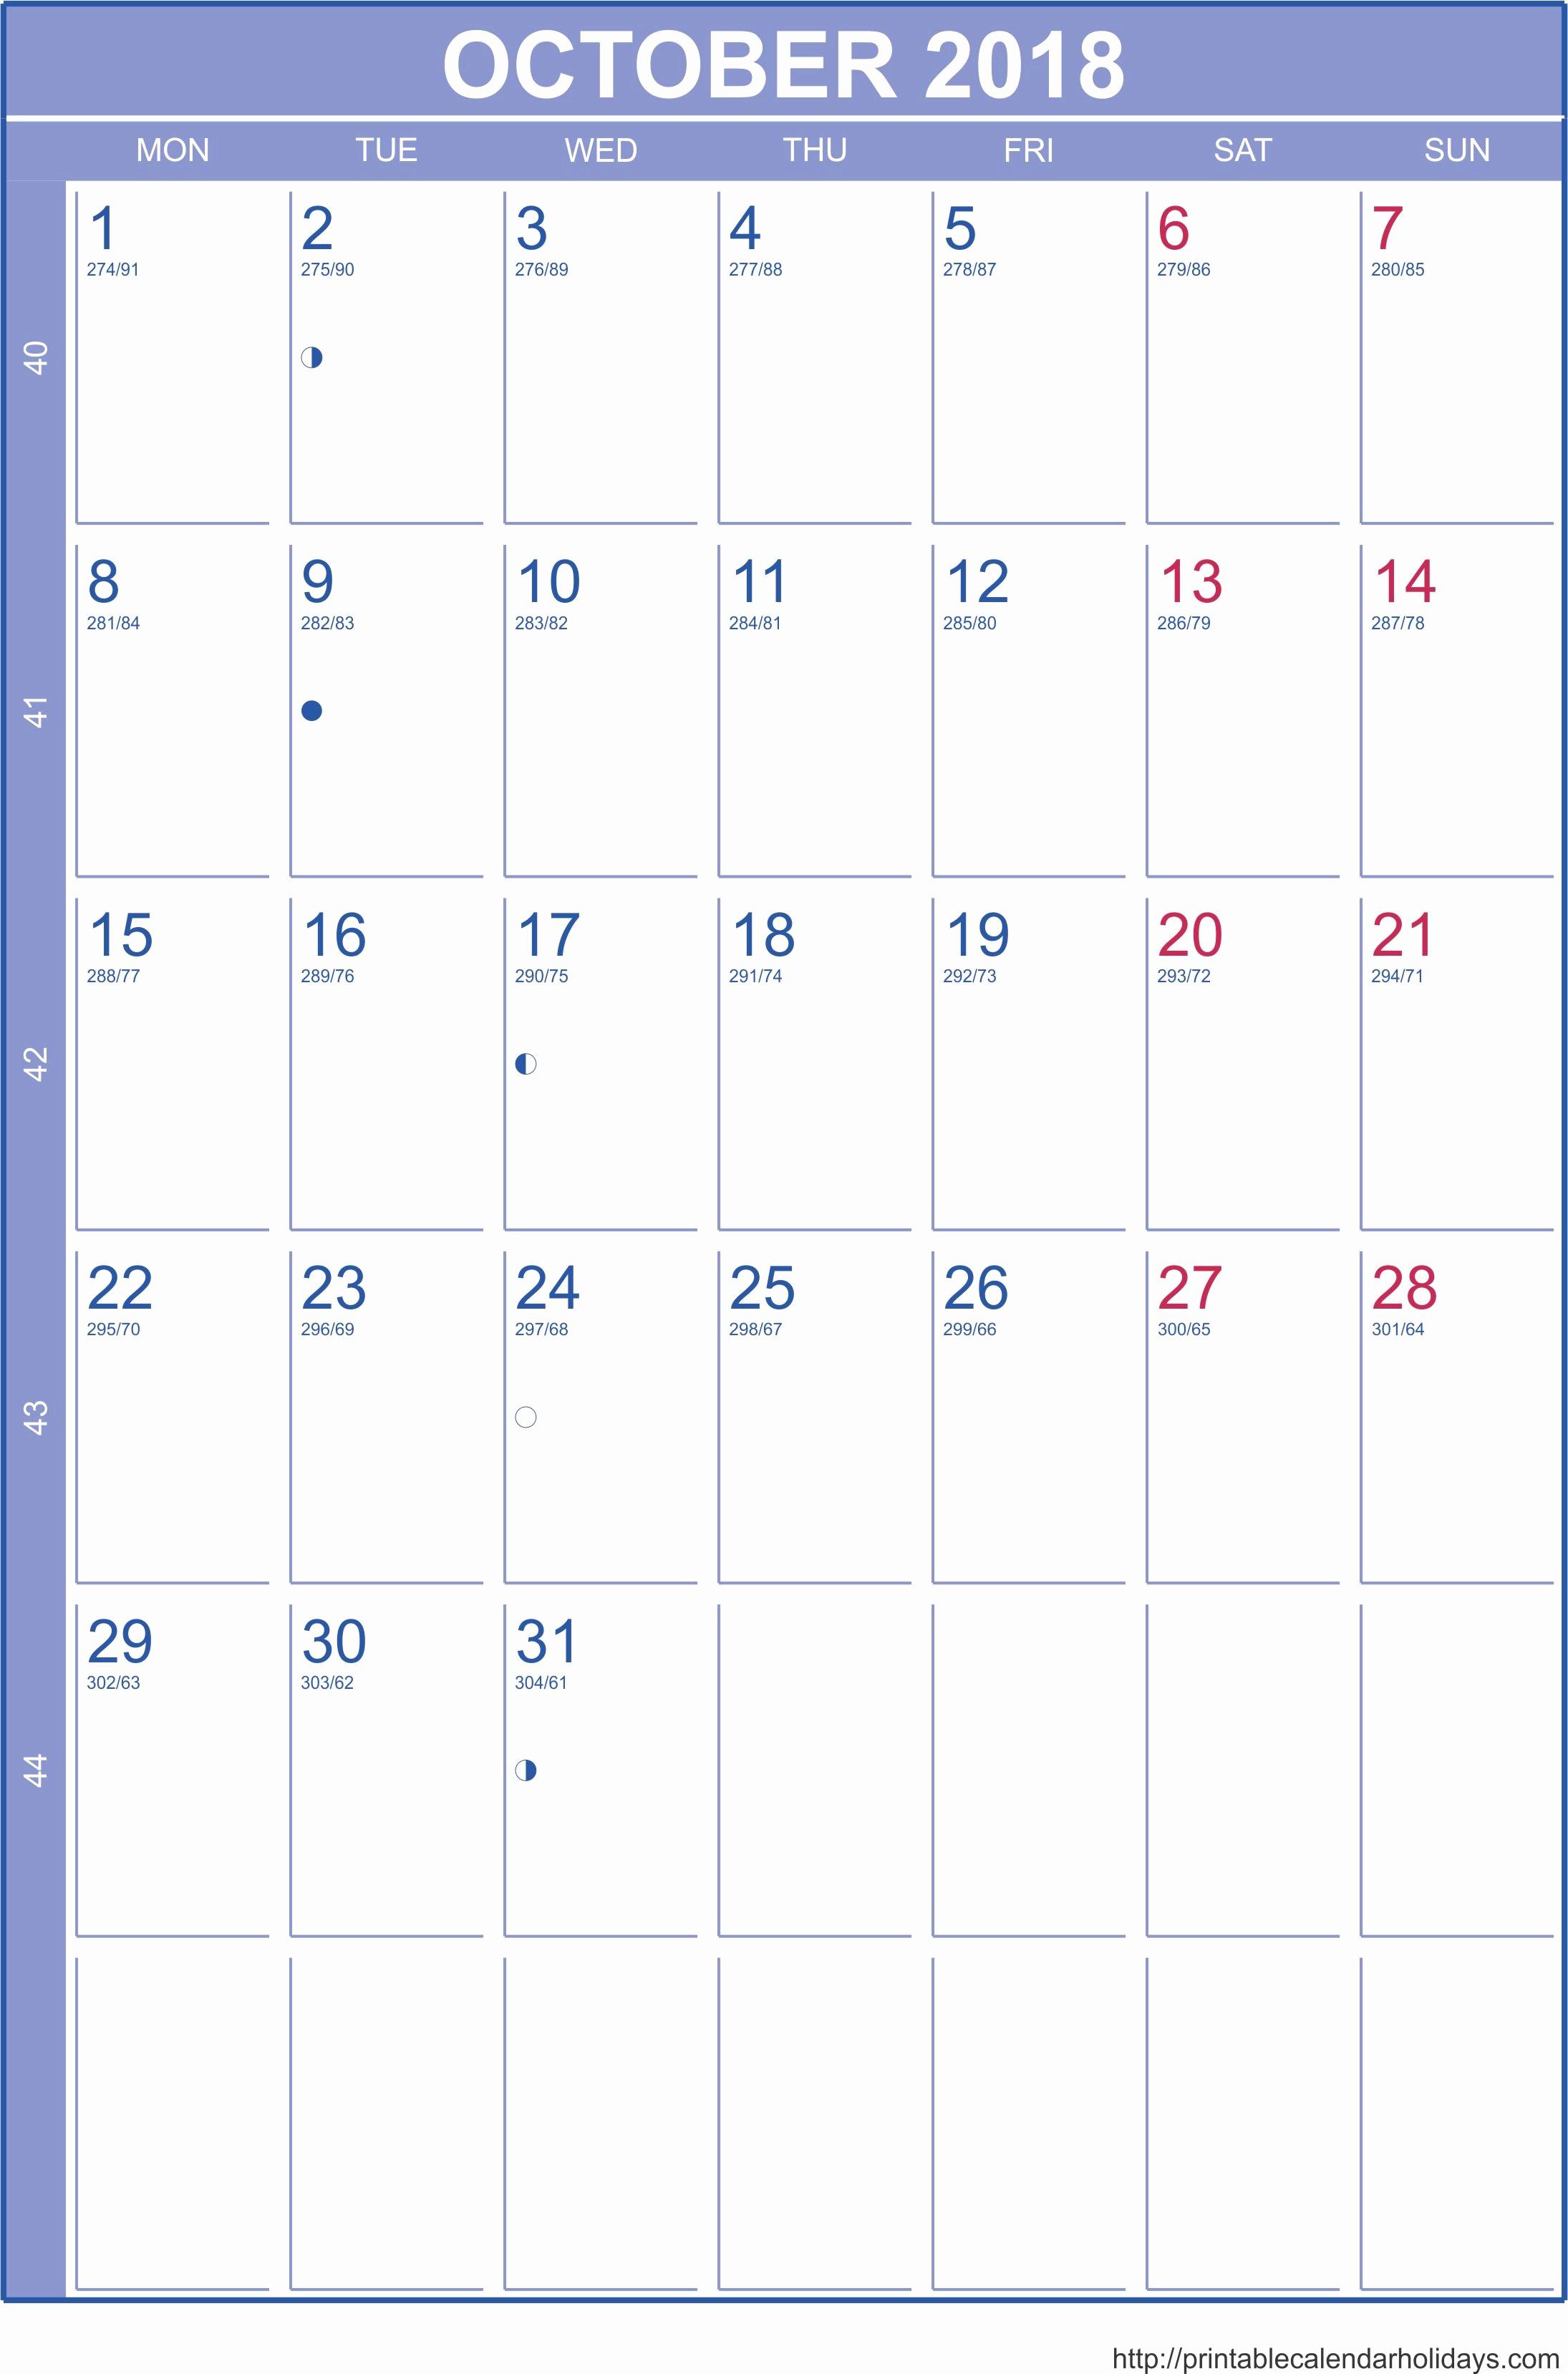 Free Printable Monthly Calendar Templates Fresh Monthly Calendars Archives Free Printable Calendar 2016